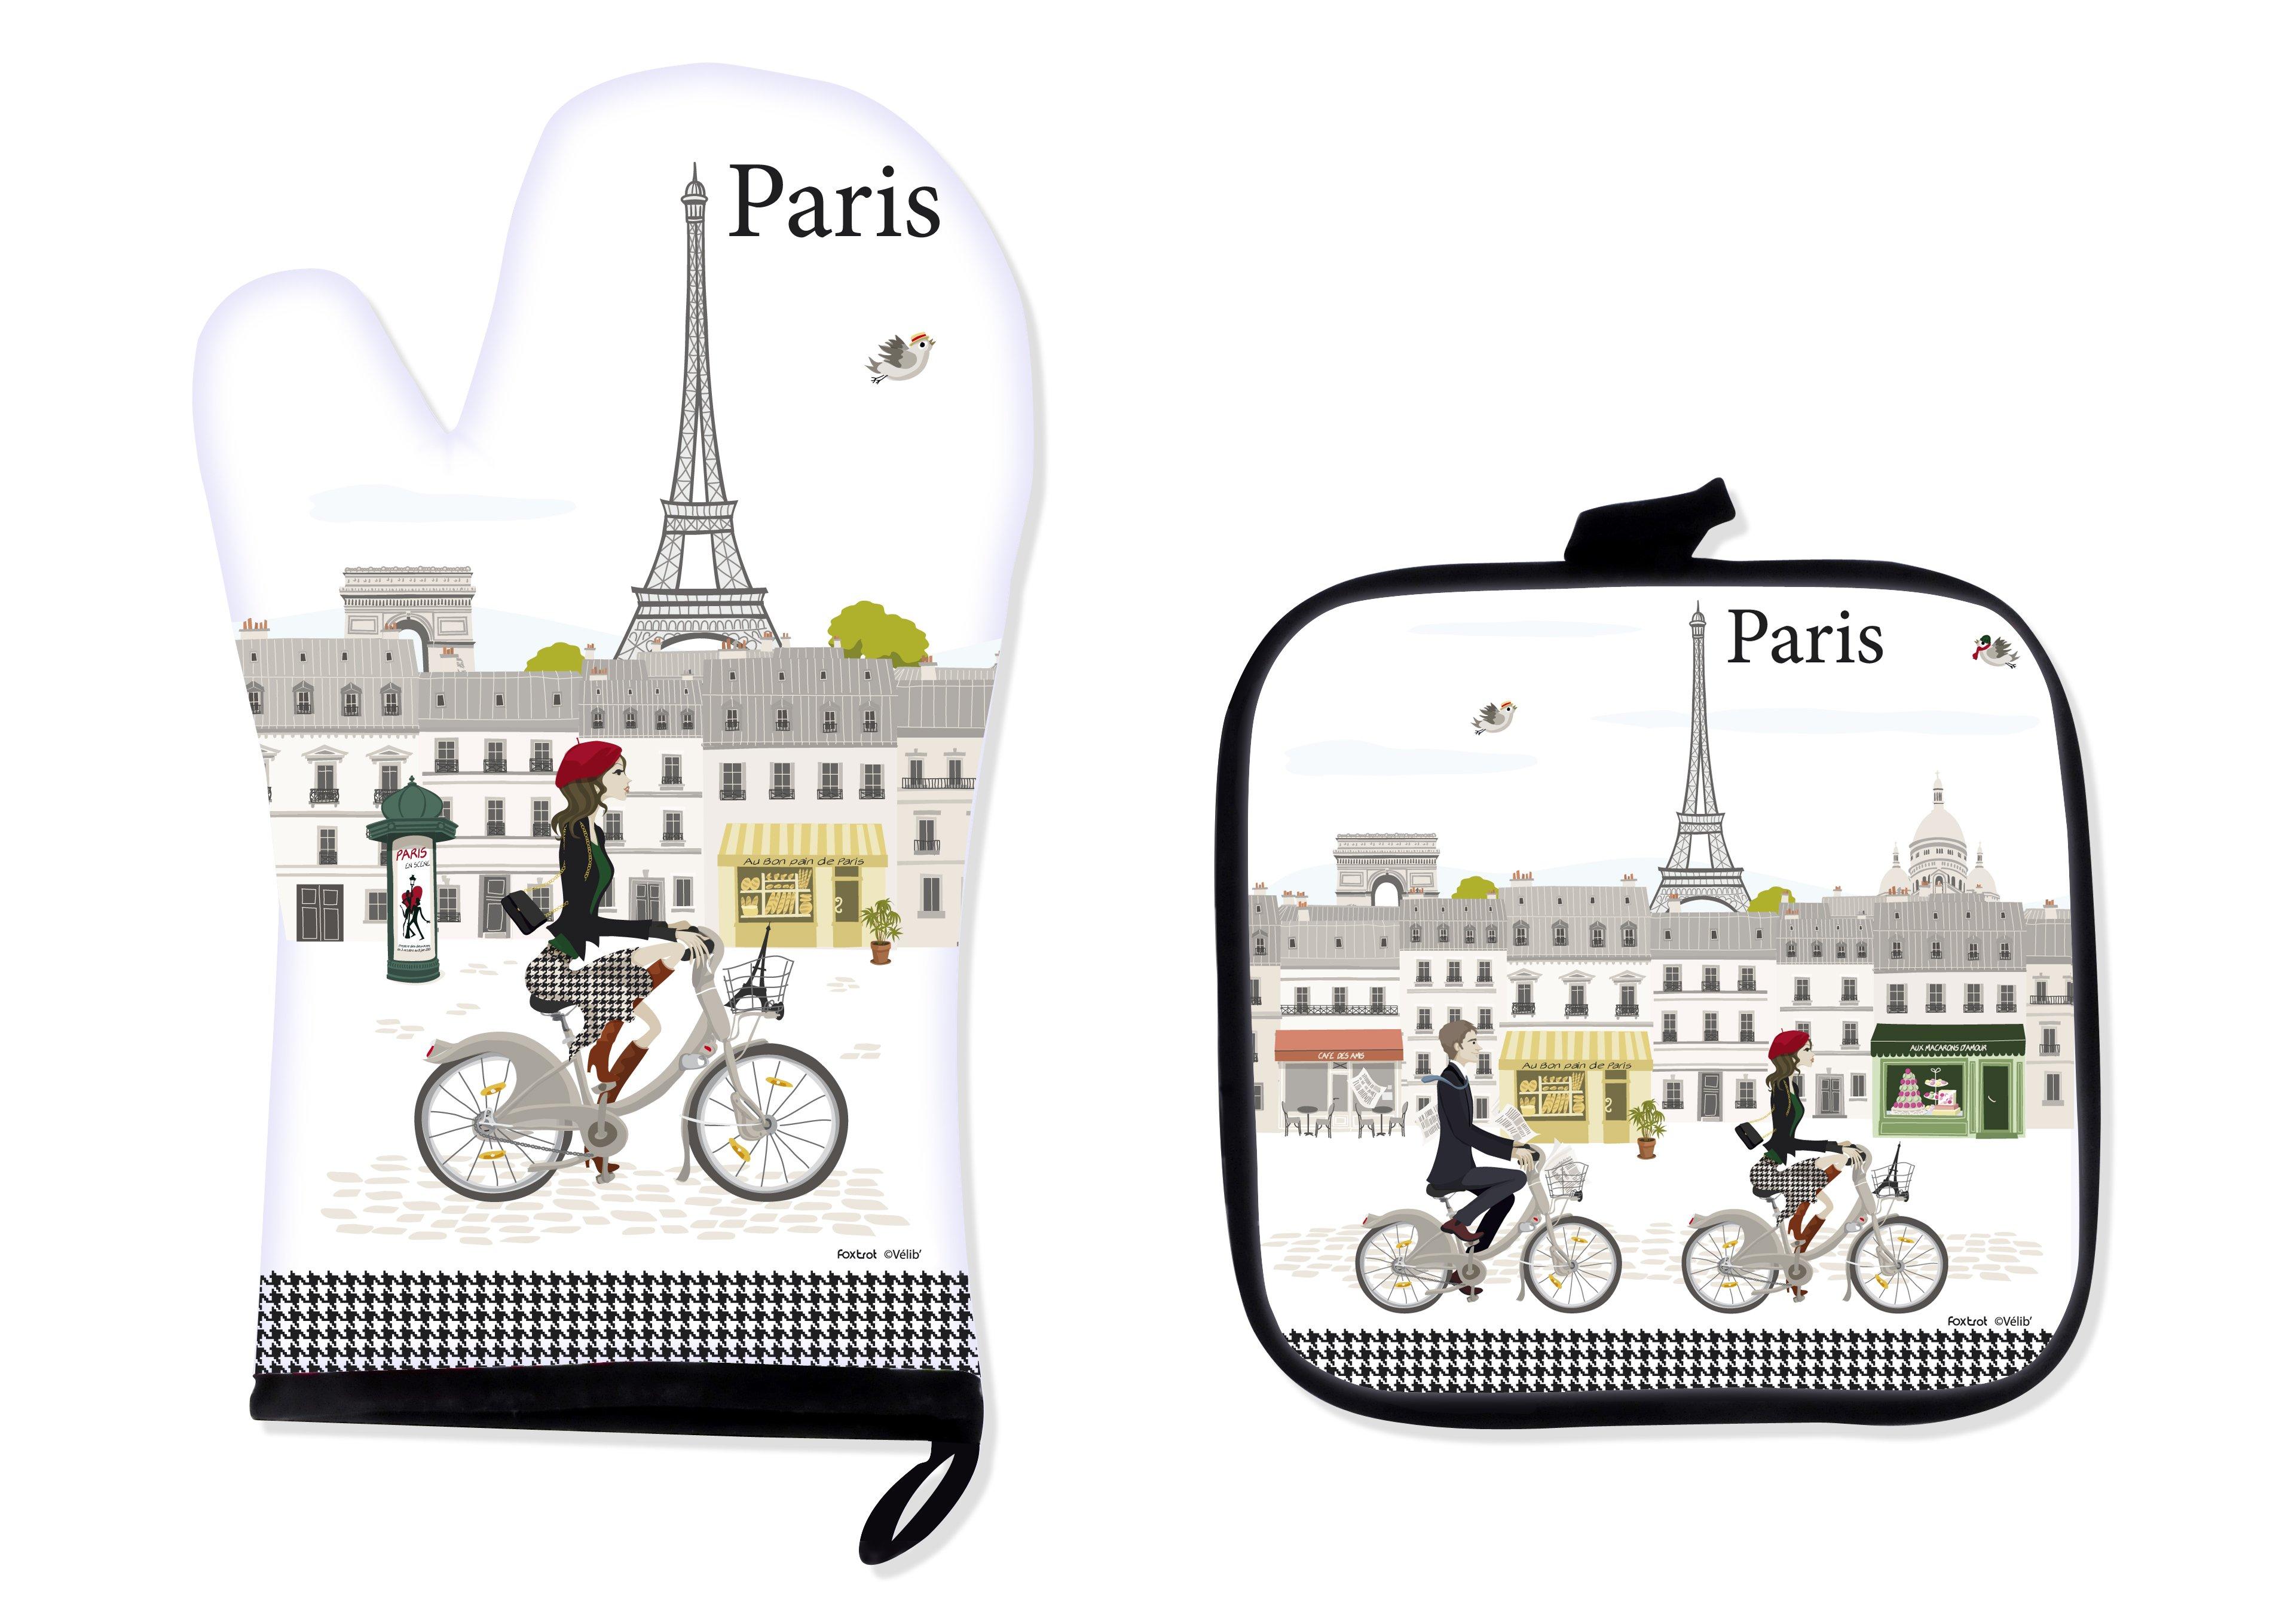 Kuchynské chňapky Foxtrot Cyklisti Paríž LIB8780